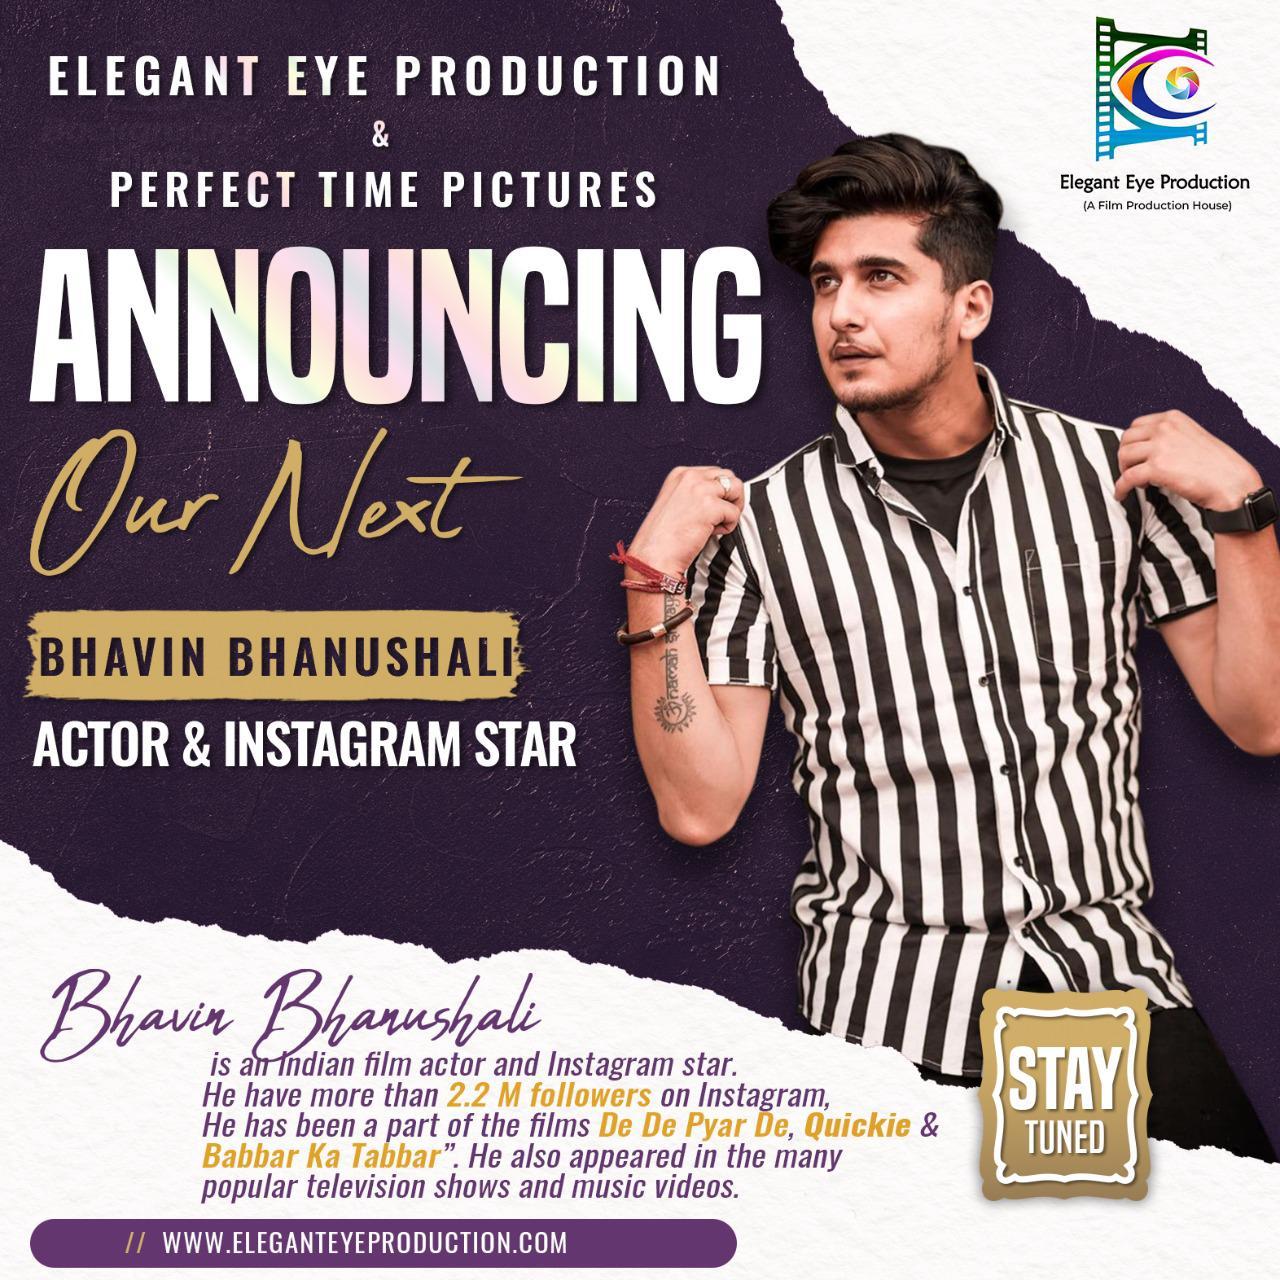 Announcing Our Next - Bhavin Bhanushali